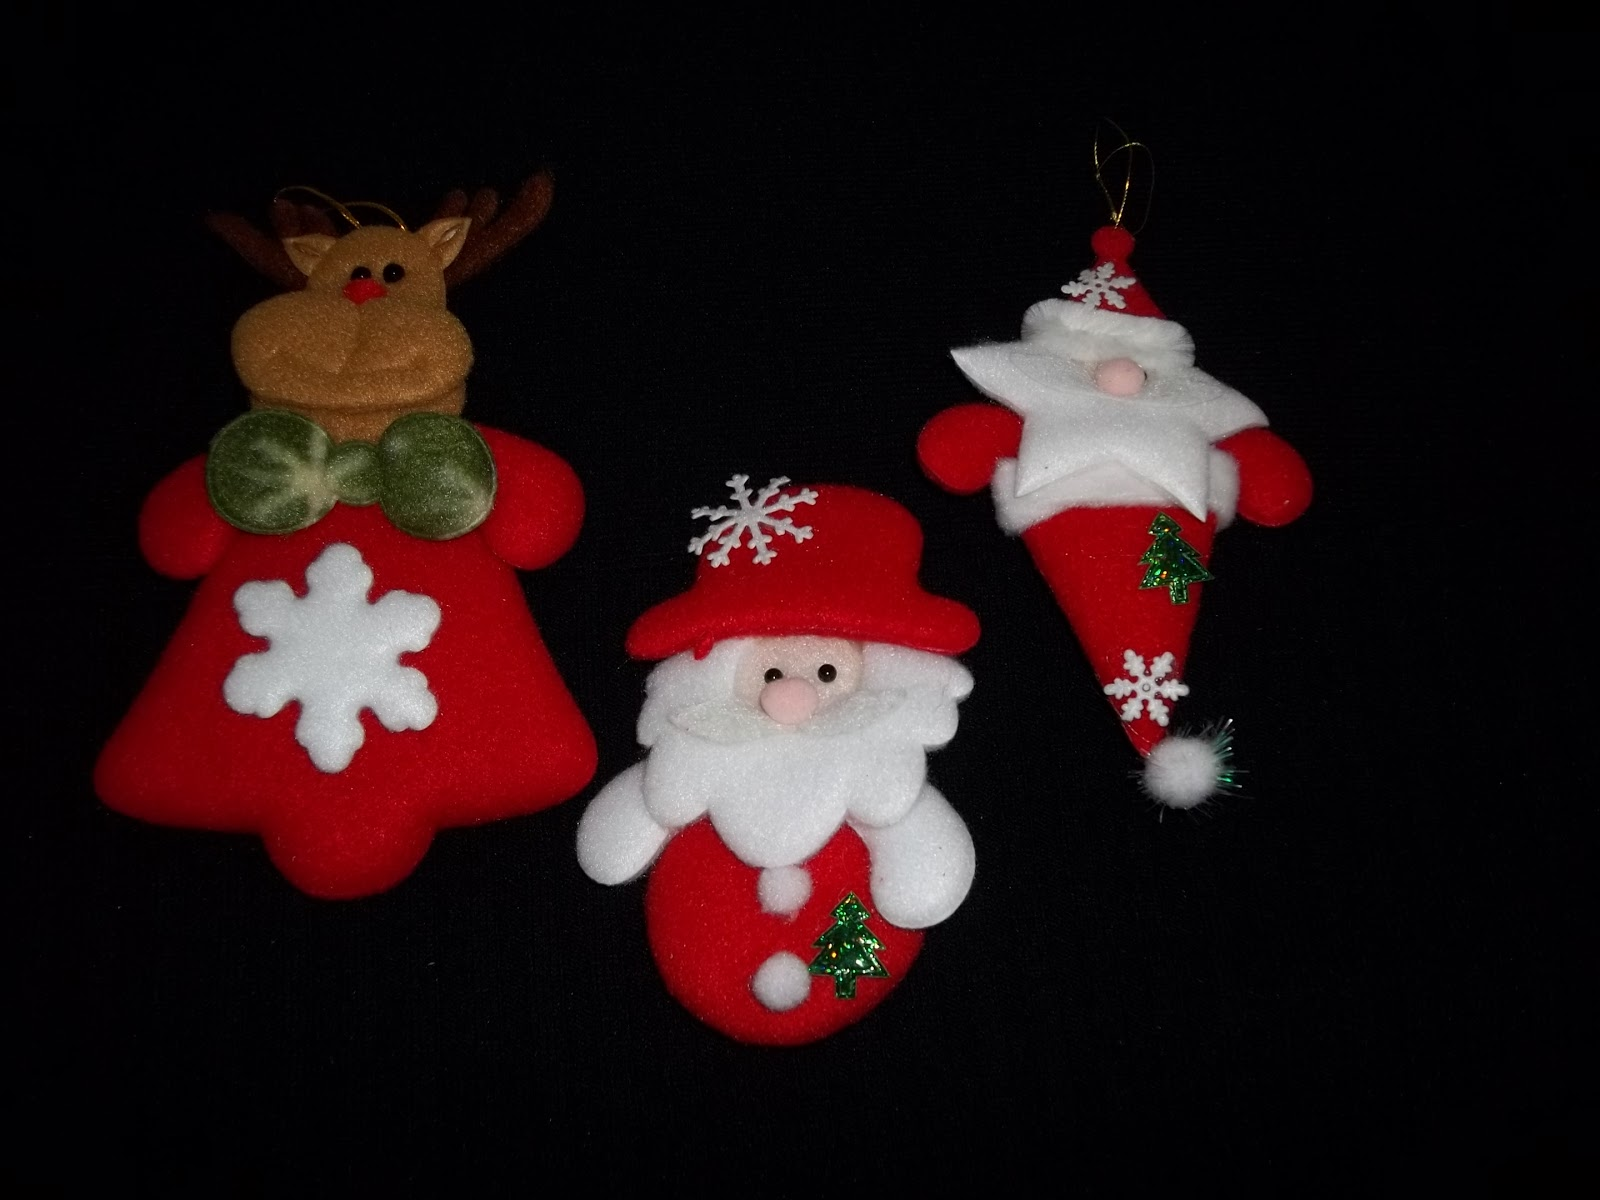 Porcelana fria adornos navide os - Videos de adornos navidenos ...